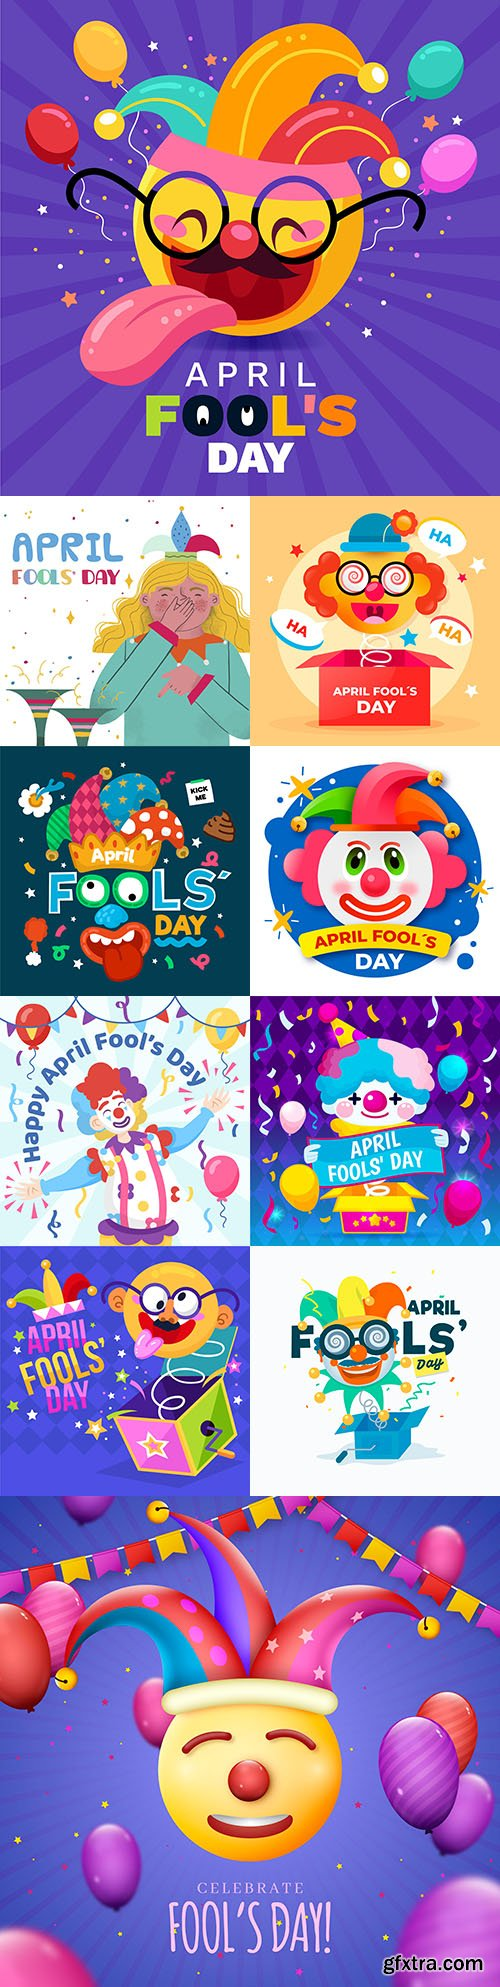 Fools day and April 1 illustration flat design 2